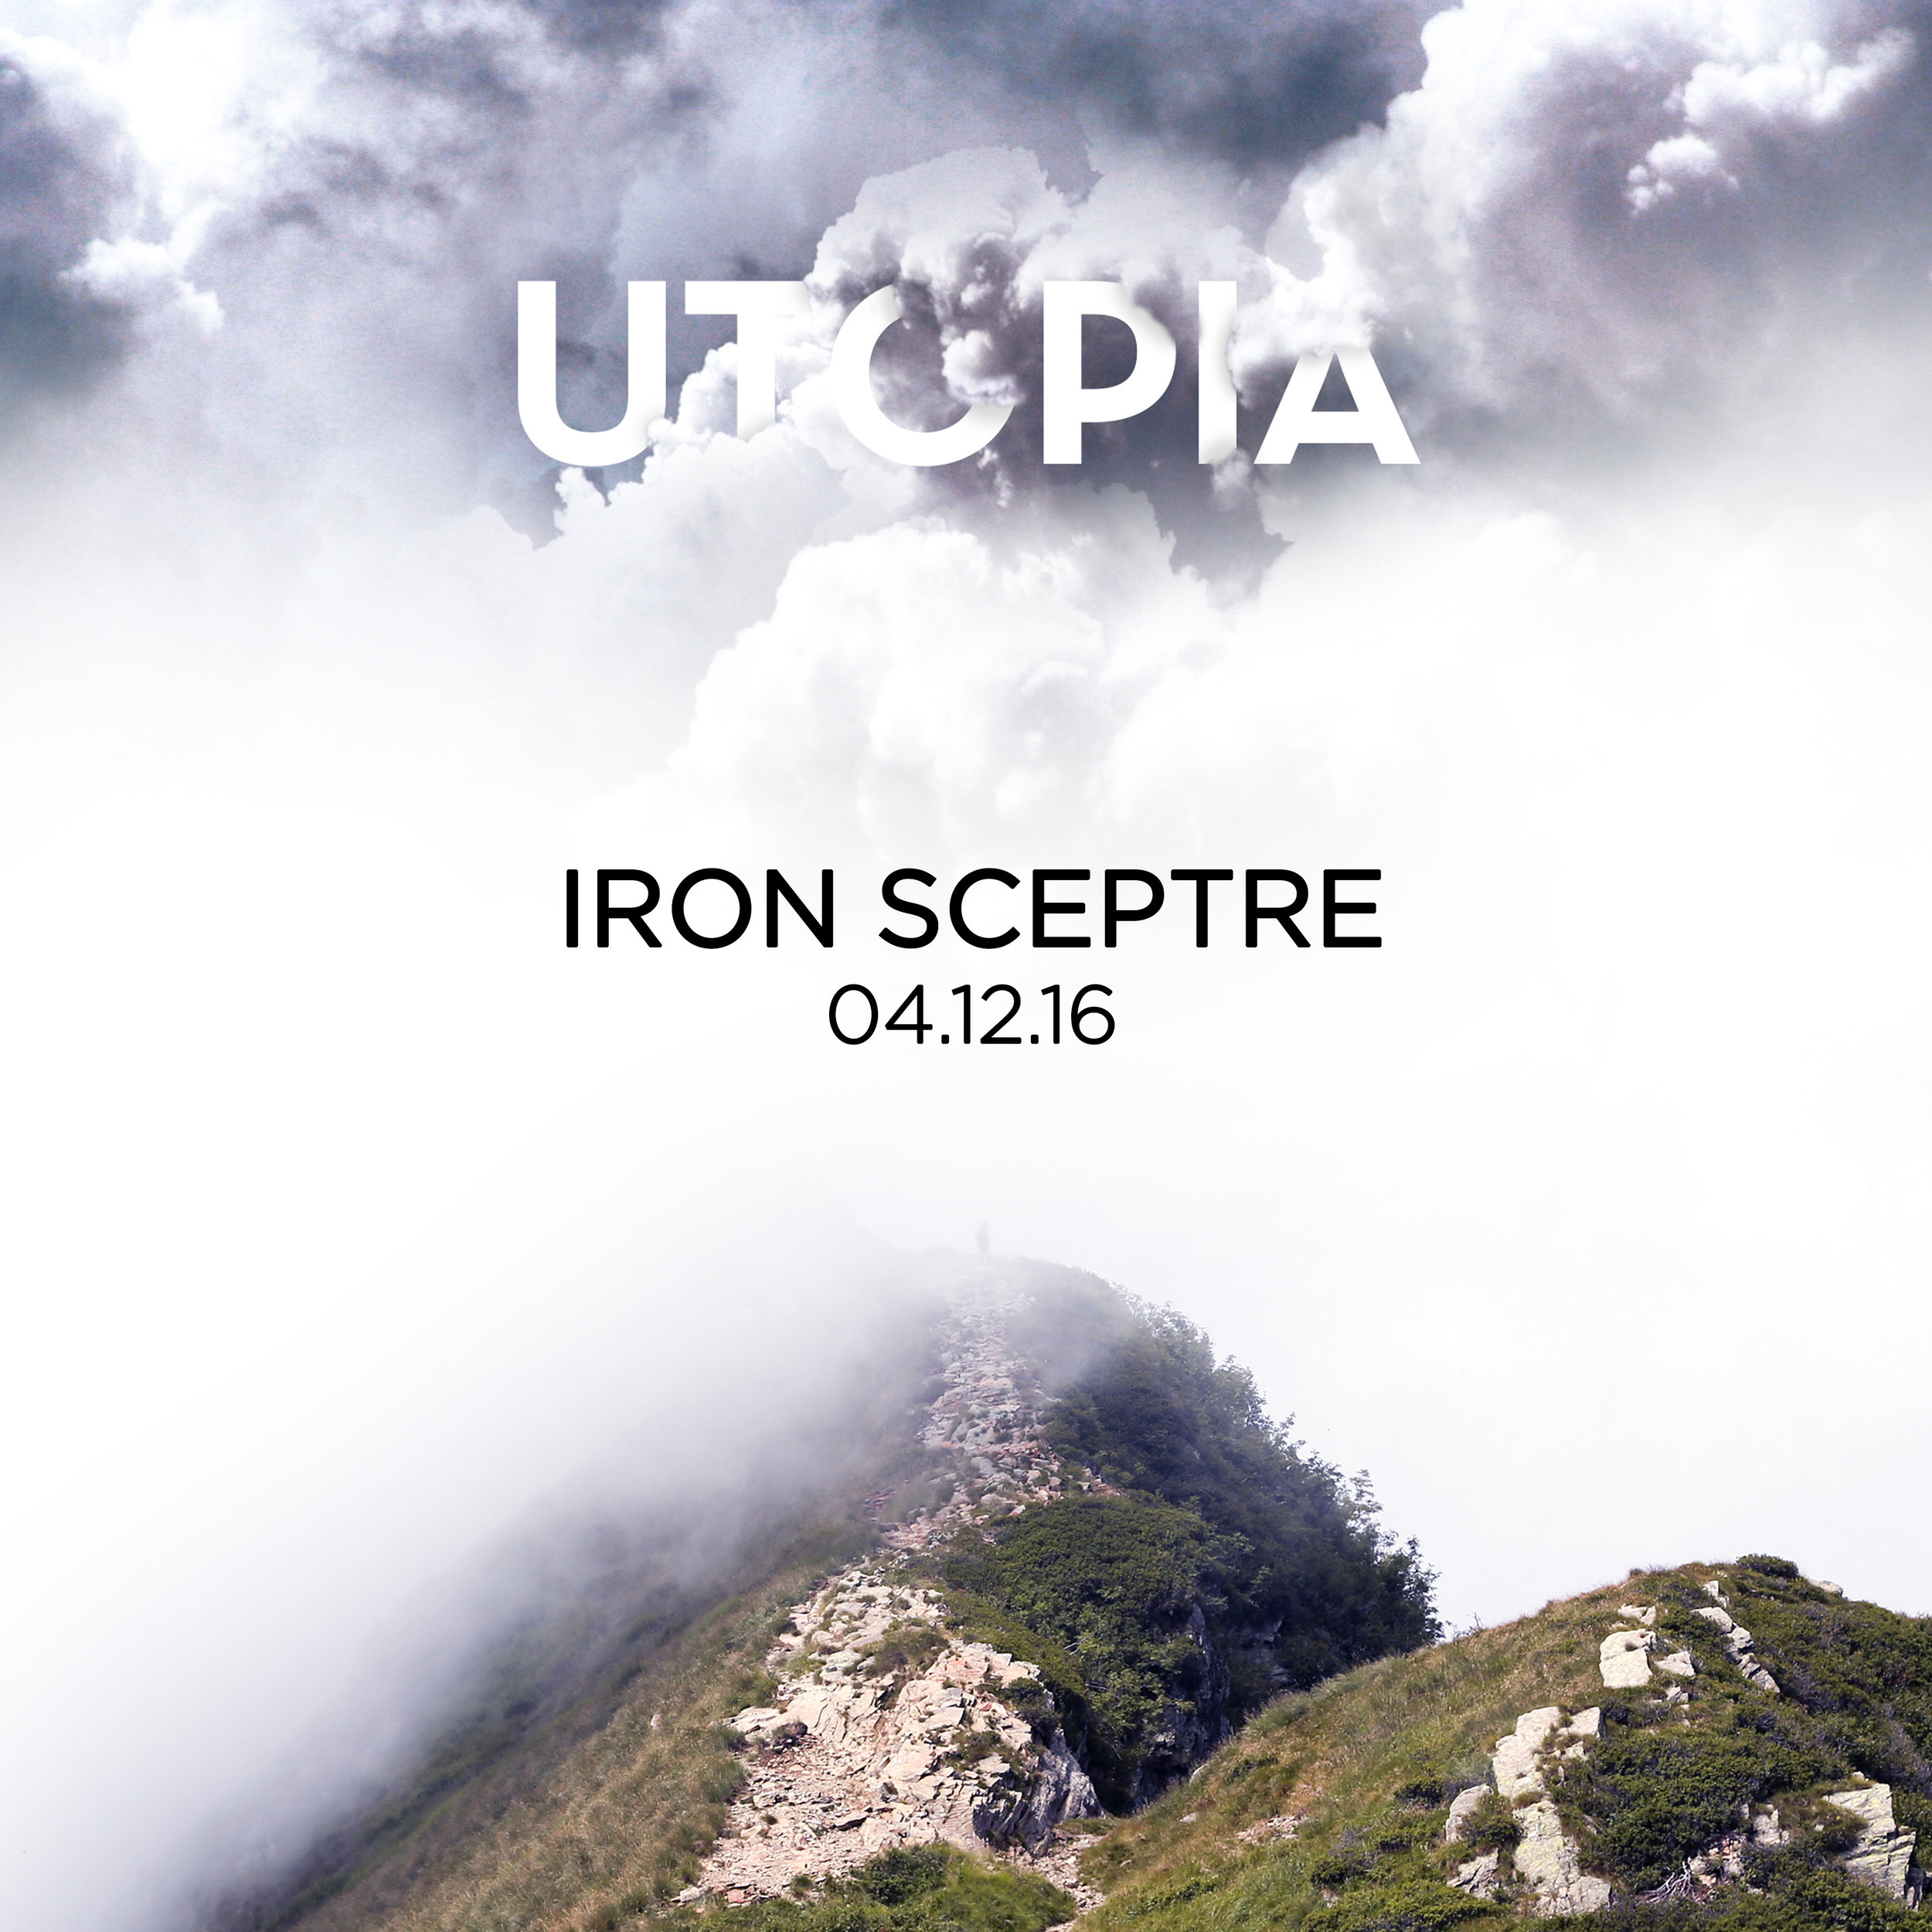 UTOPIA_Insta_Series5.jpg